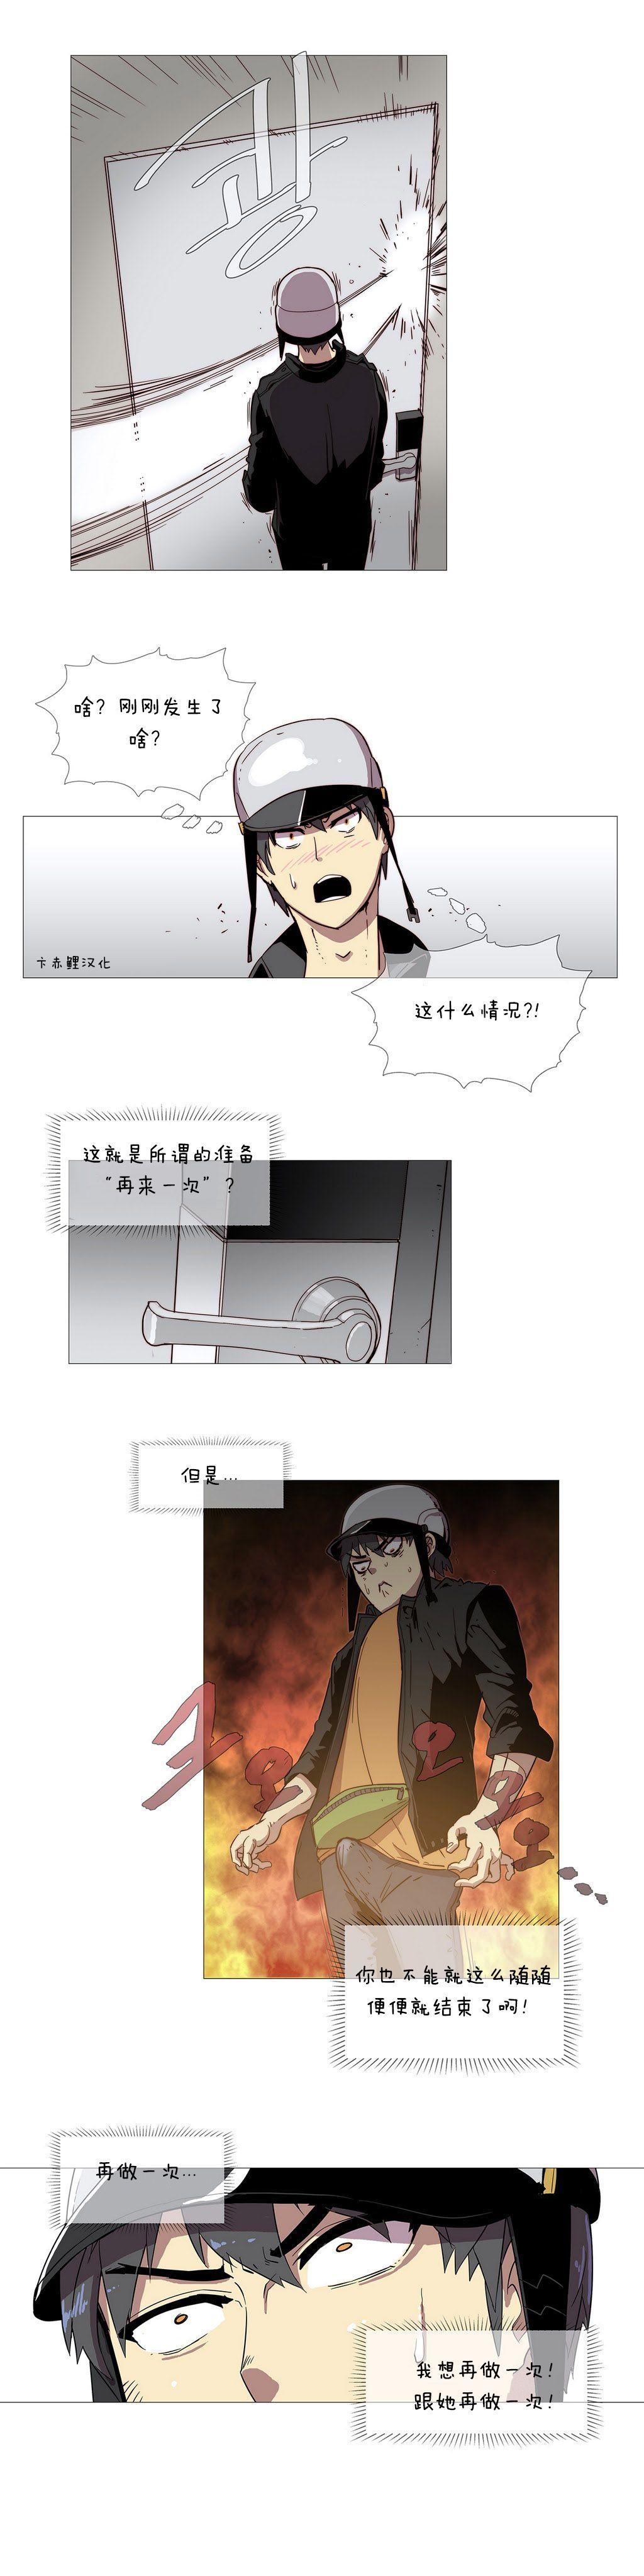 HouseHold Affairs 【卞赤鲤个人汉化】1~33话(持续更新中) 28